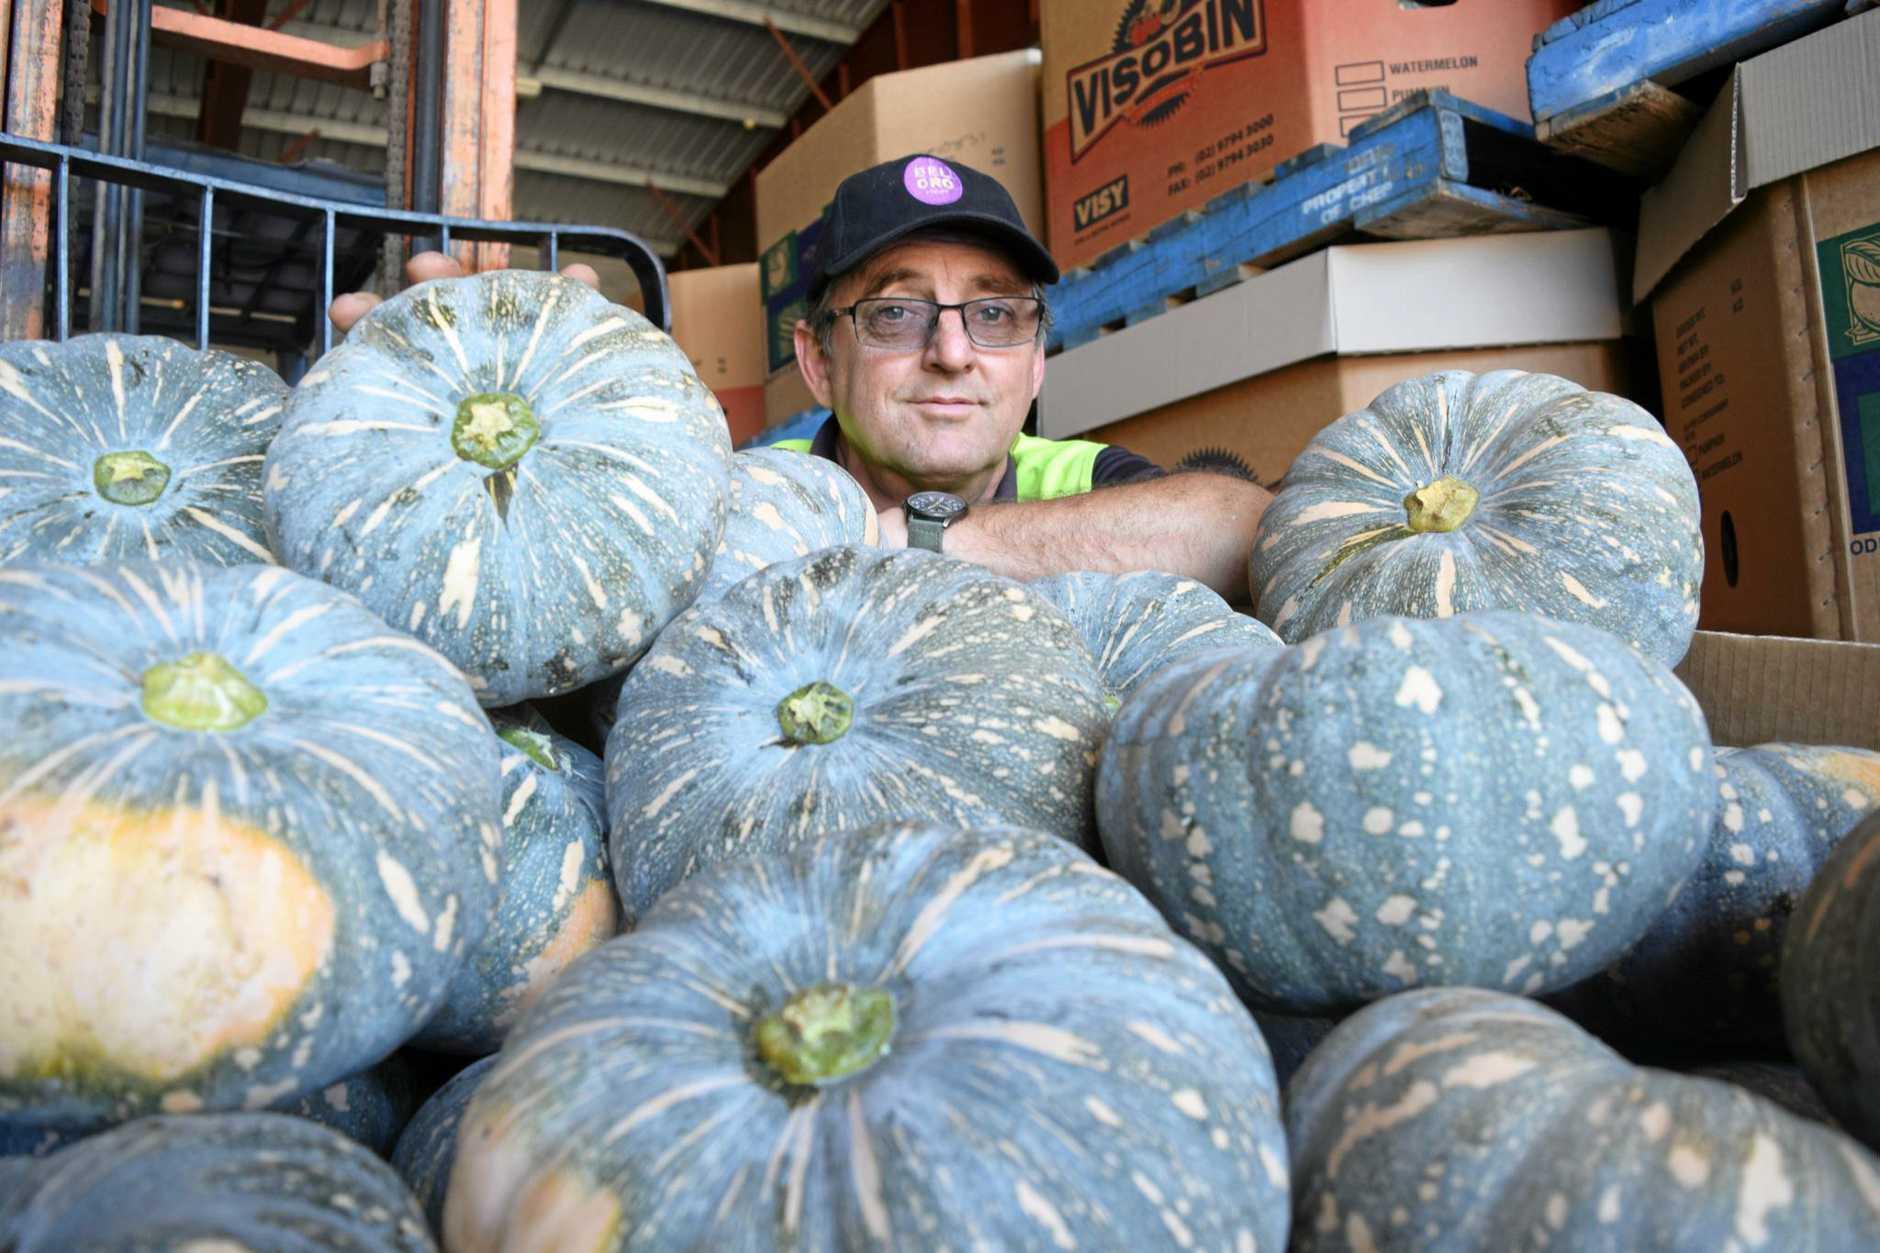 PUMPKIN APLENTY: Beemart's Geoff Gauld says pumpkin is cheap and abundant this Christmas.